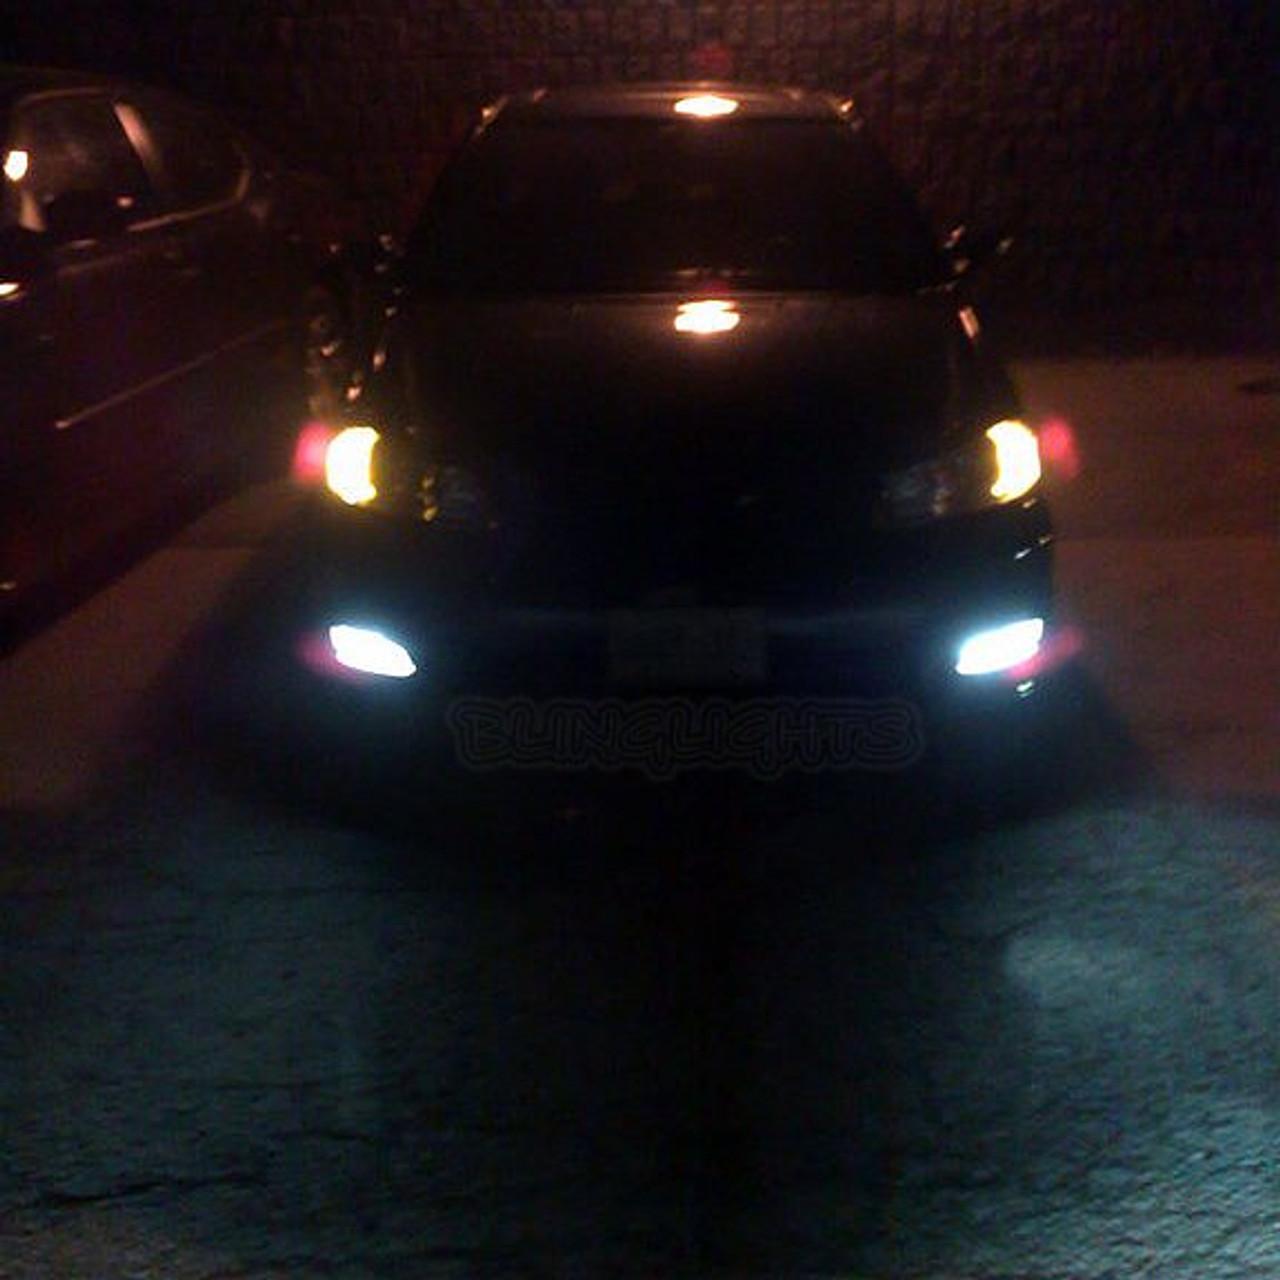 Combo LED Headlights+Fog Light for Toyota Camry 2002-2006 Corolla 2005-2008 6pcs